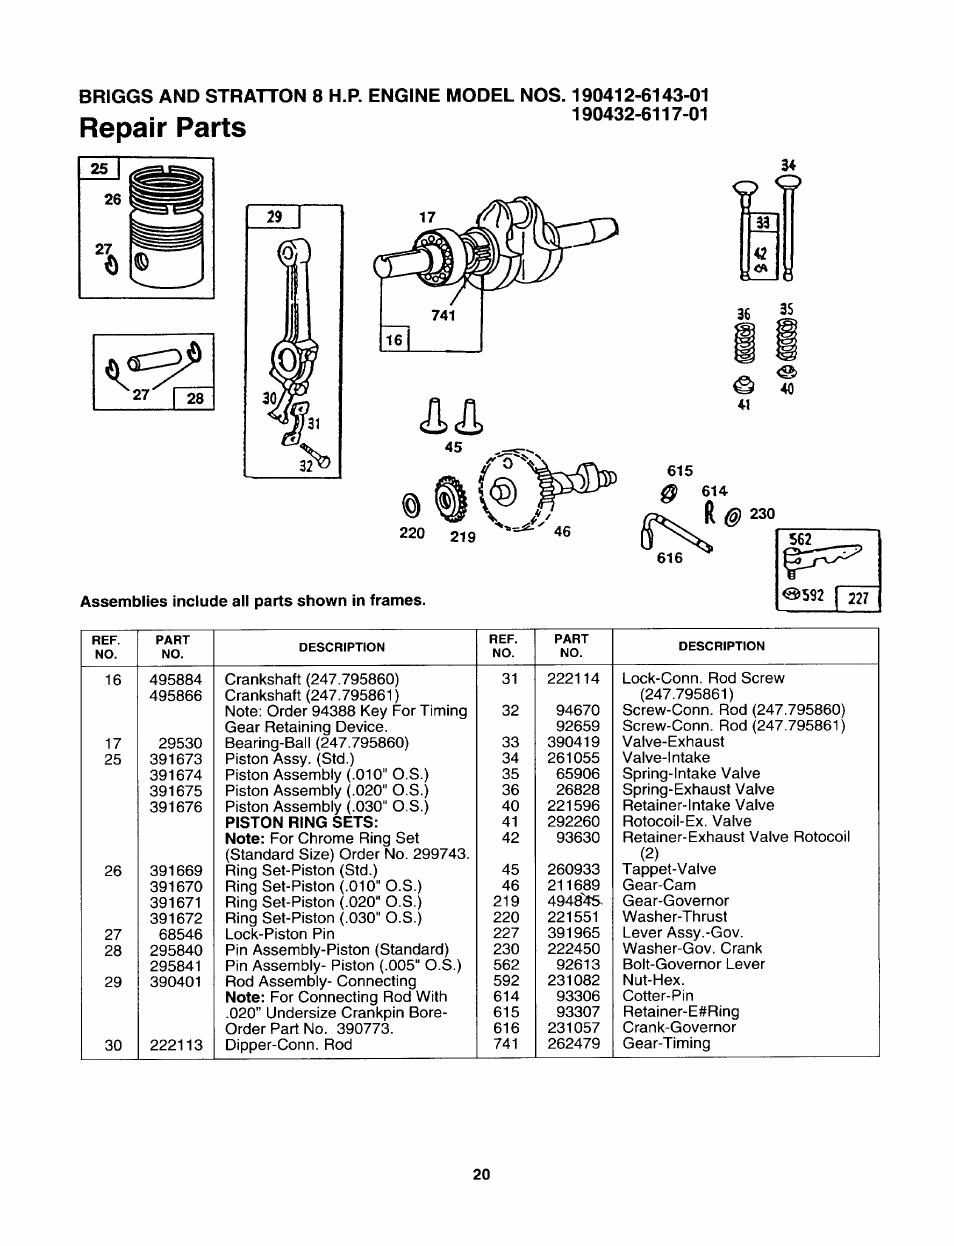 repair parts sears 247 795860 user manual page 20 24 rh manualsdir com sears user manuals online sears user manual 916915